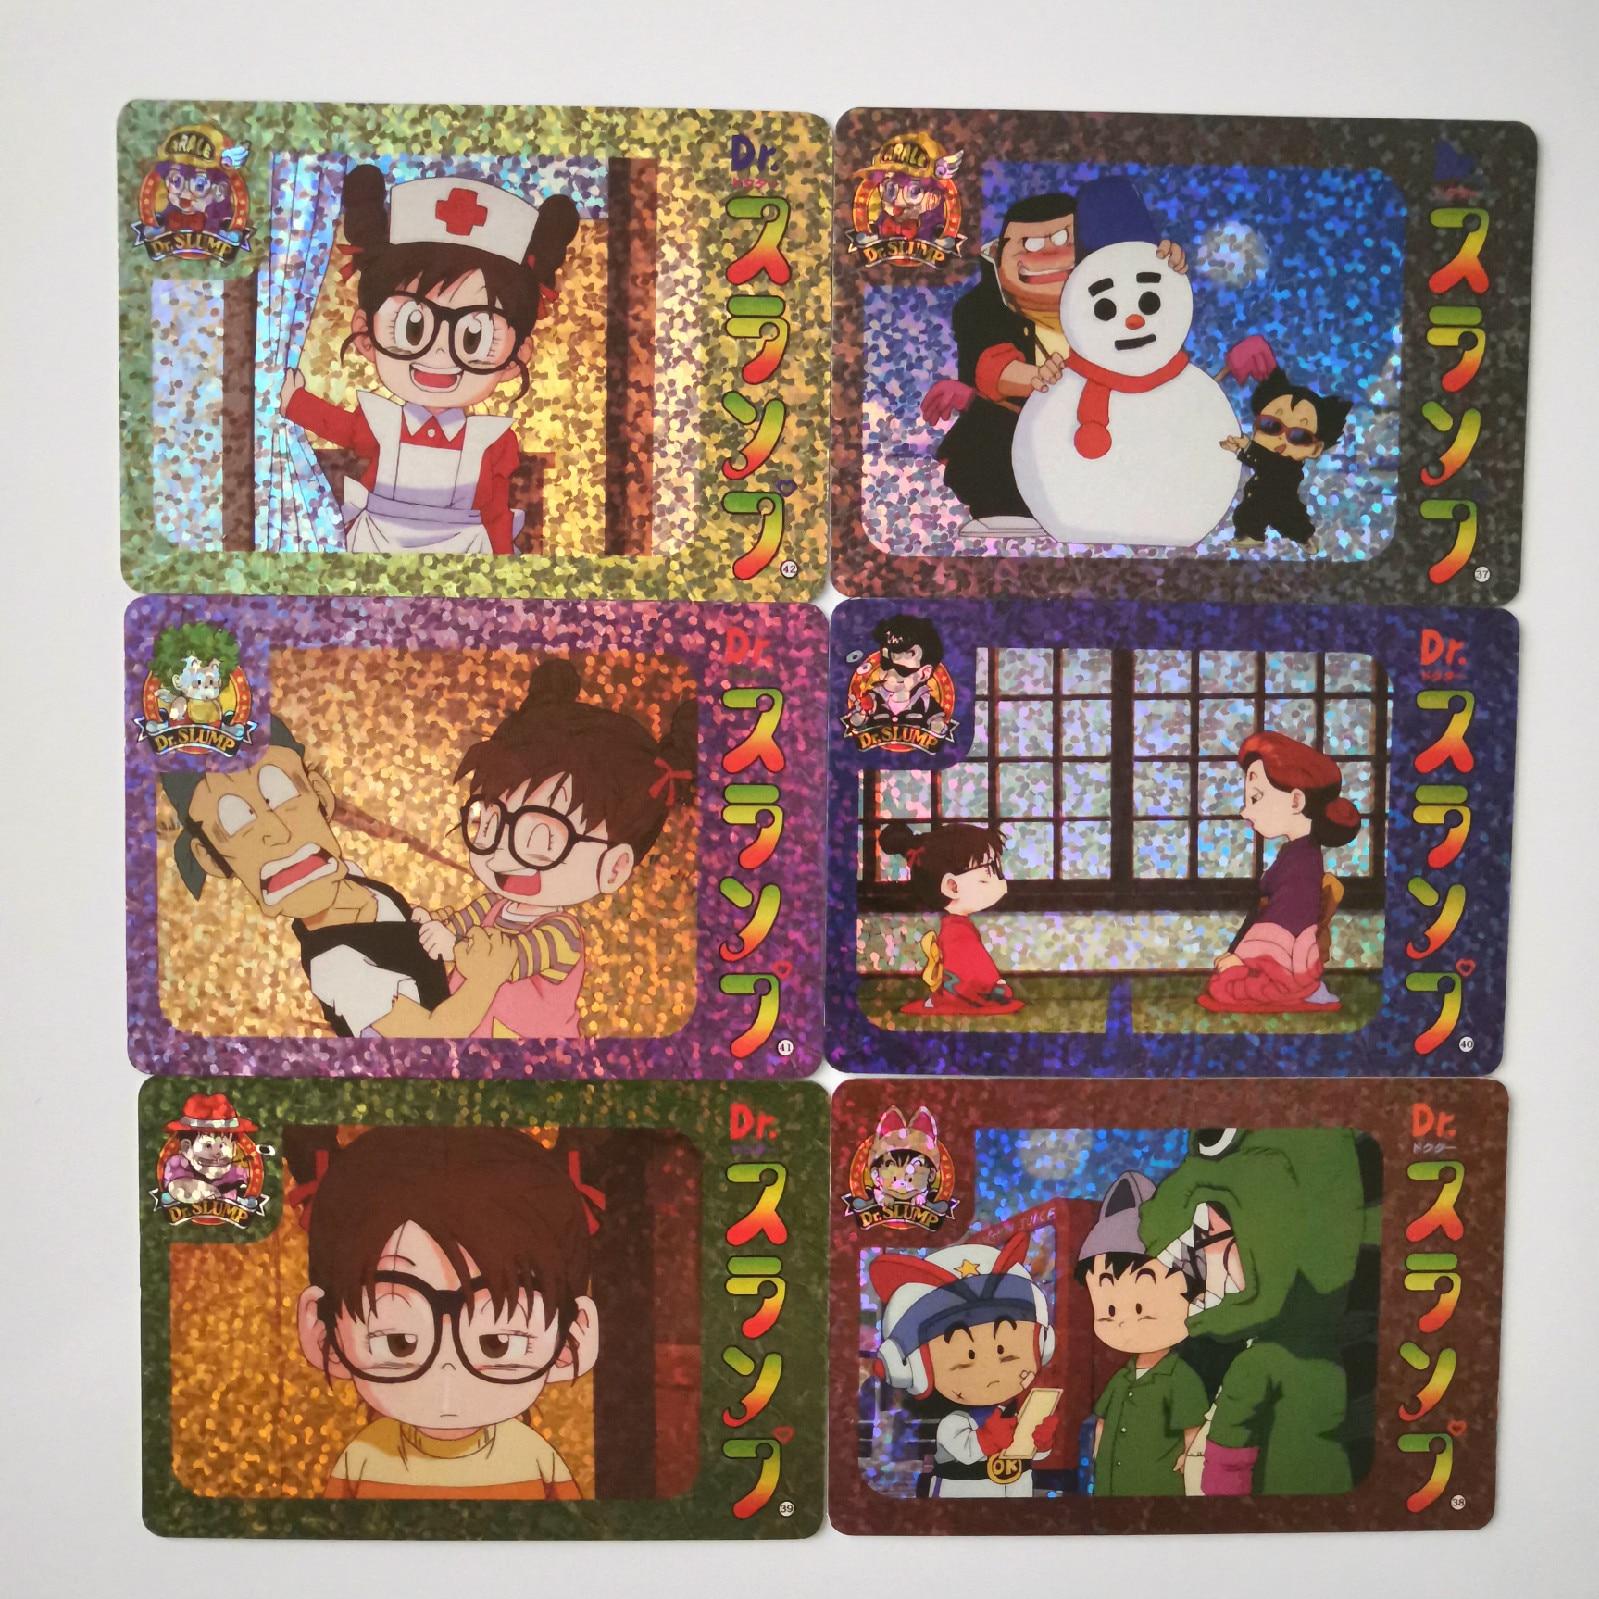 34 Teile/satz Arale Drama Karte Saison 2 Sets Heroes Schlacht Karte Sammlung Anime Karten